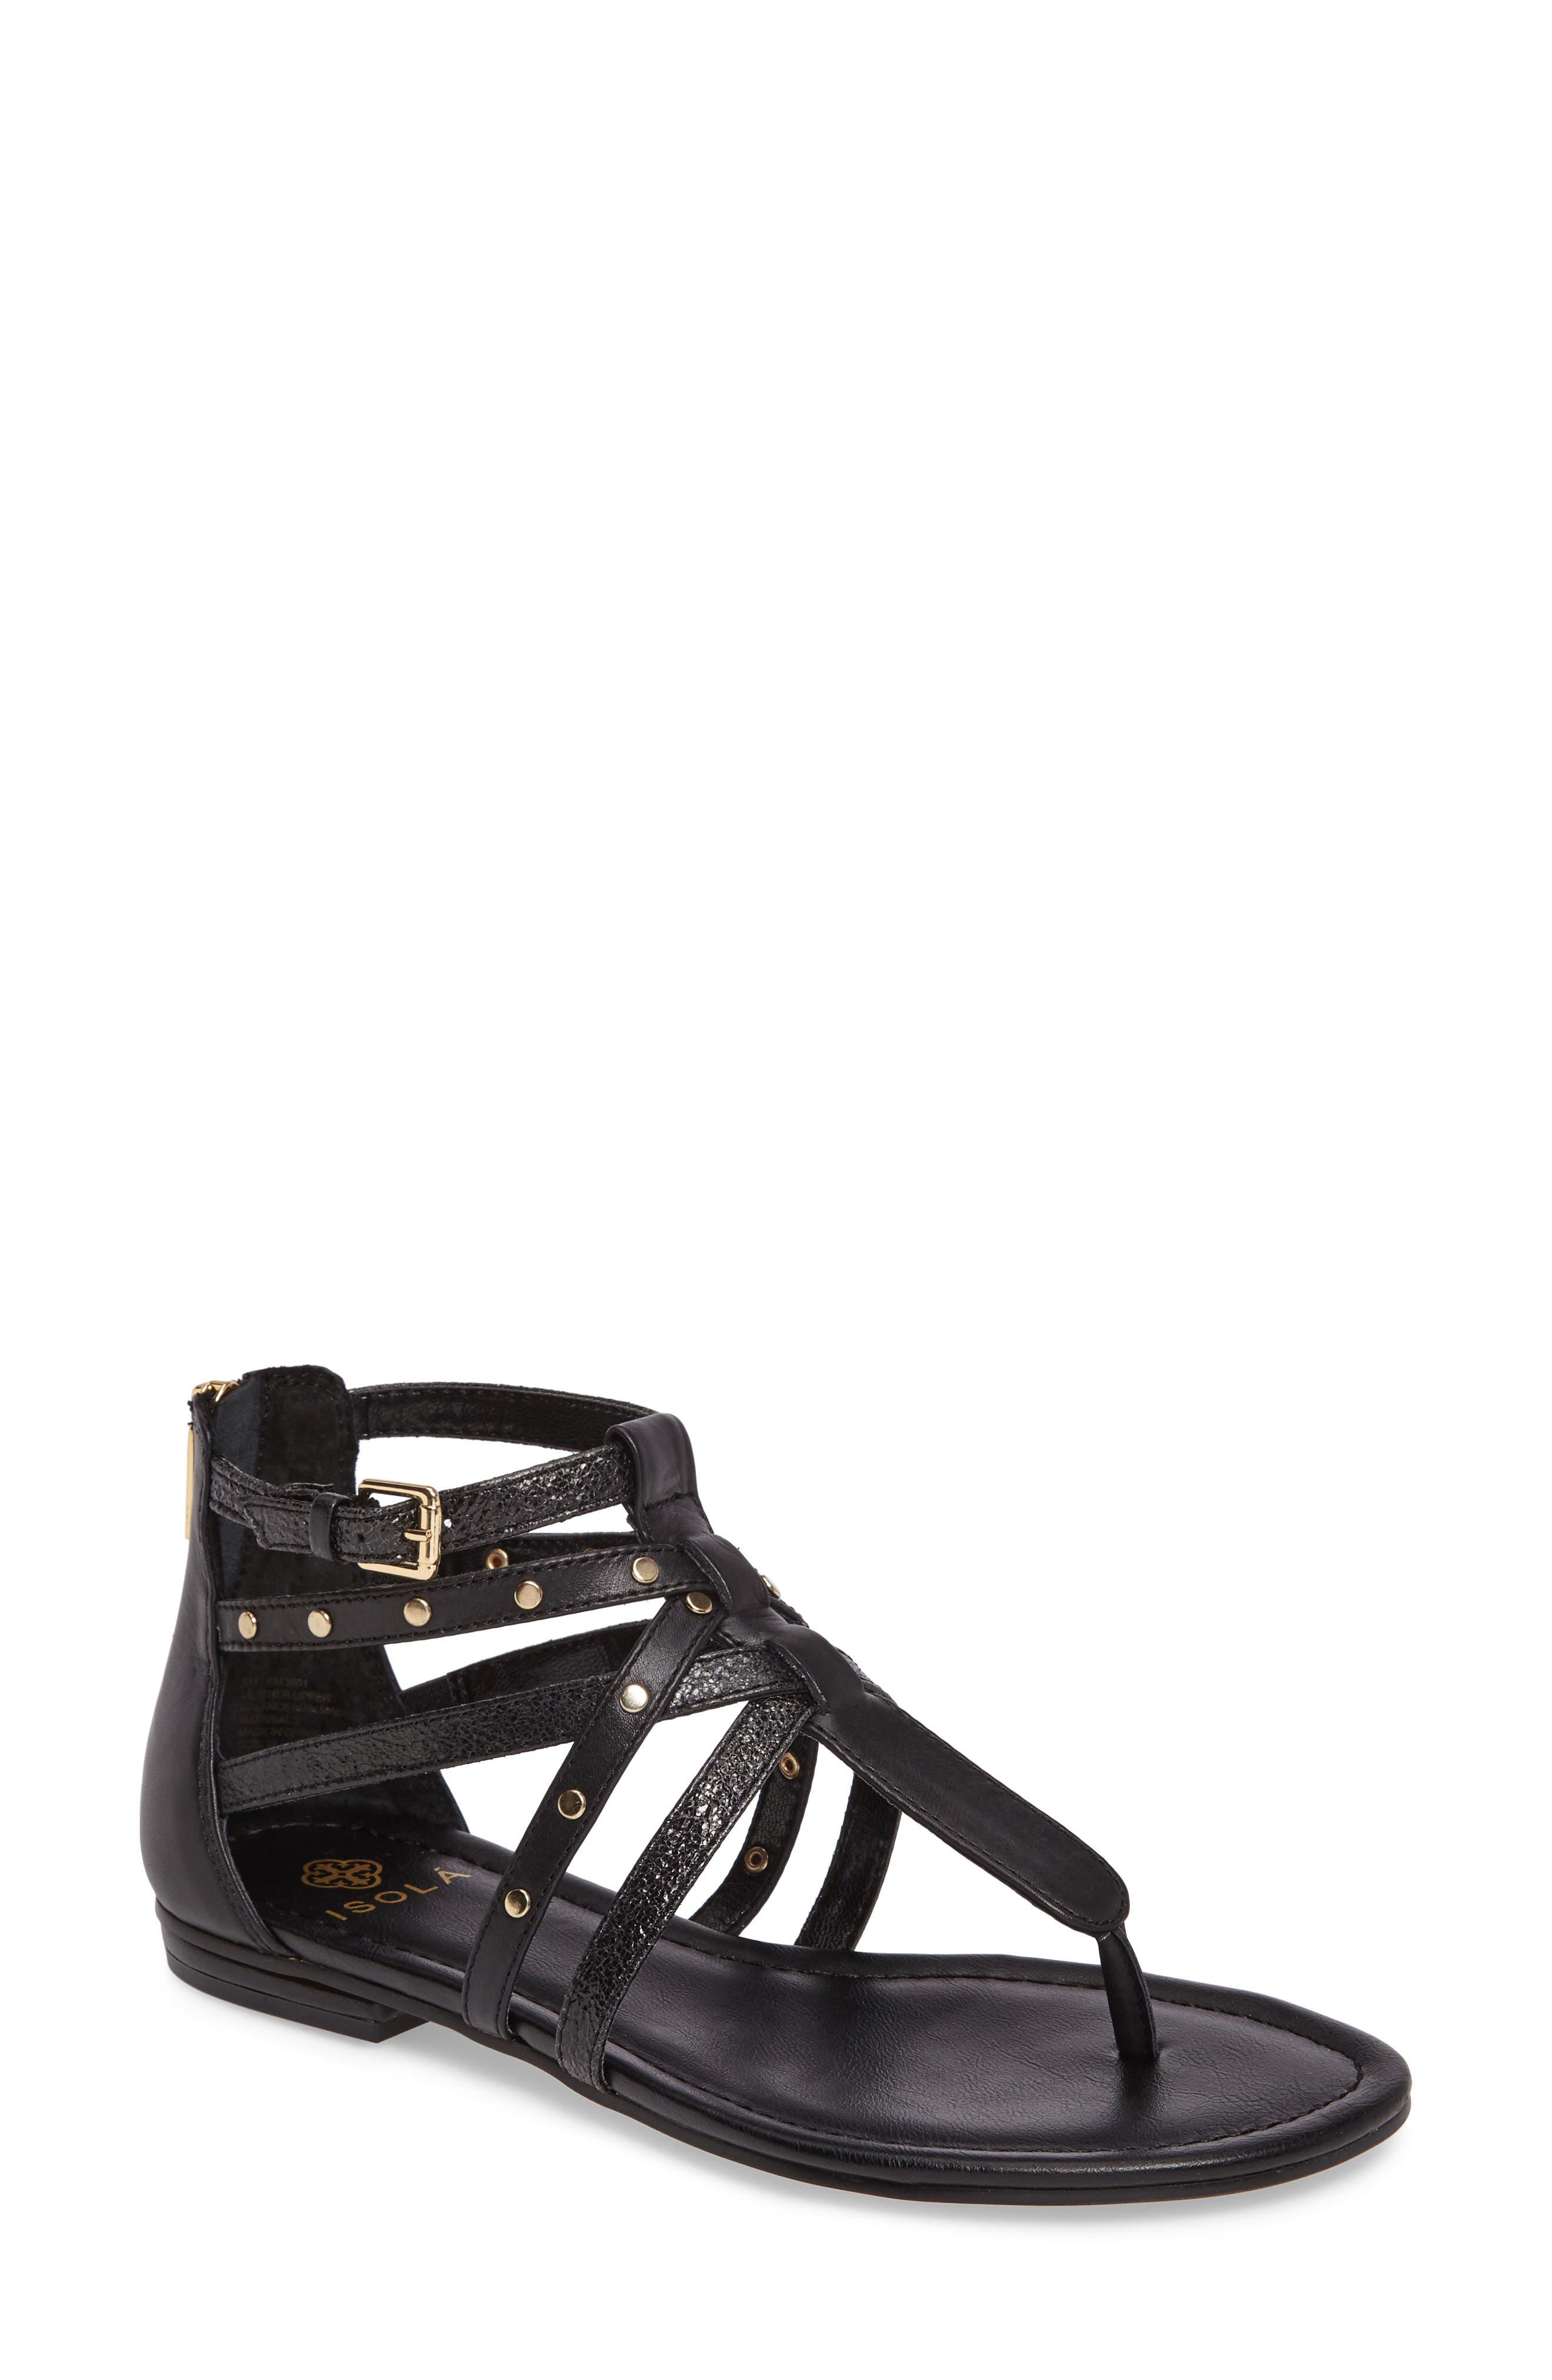 ISOLÁ Melara T-Strap Gladiator Sandal, Main, color, BLACK LEATHER